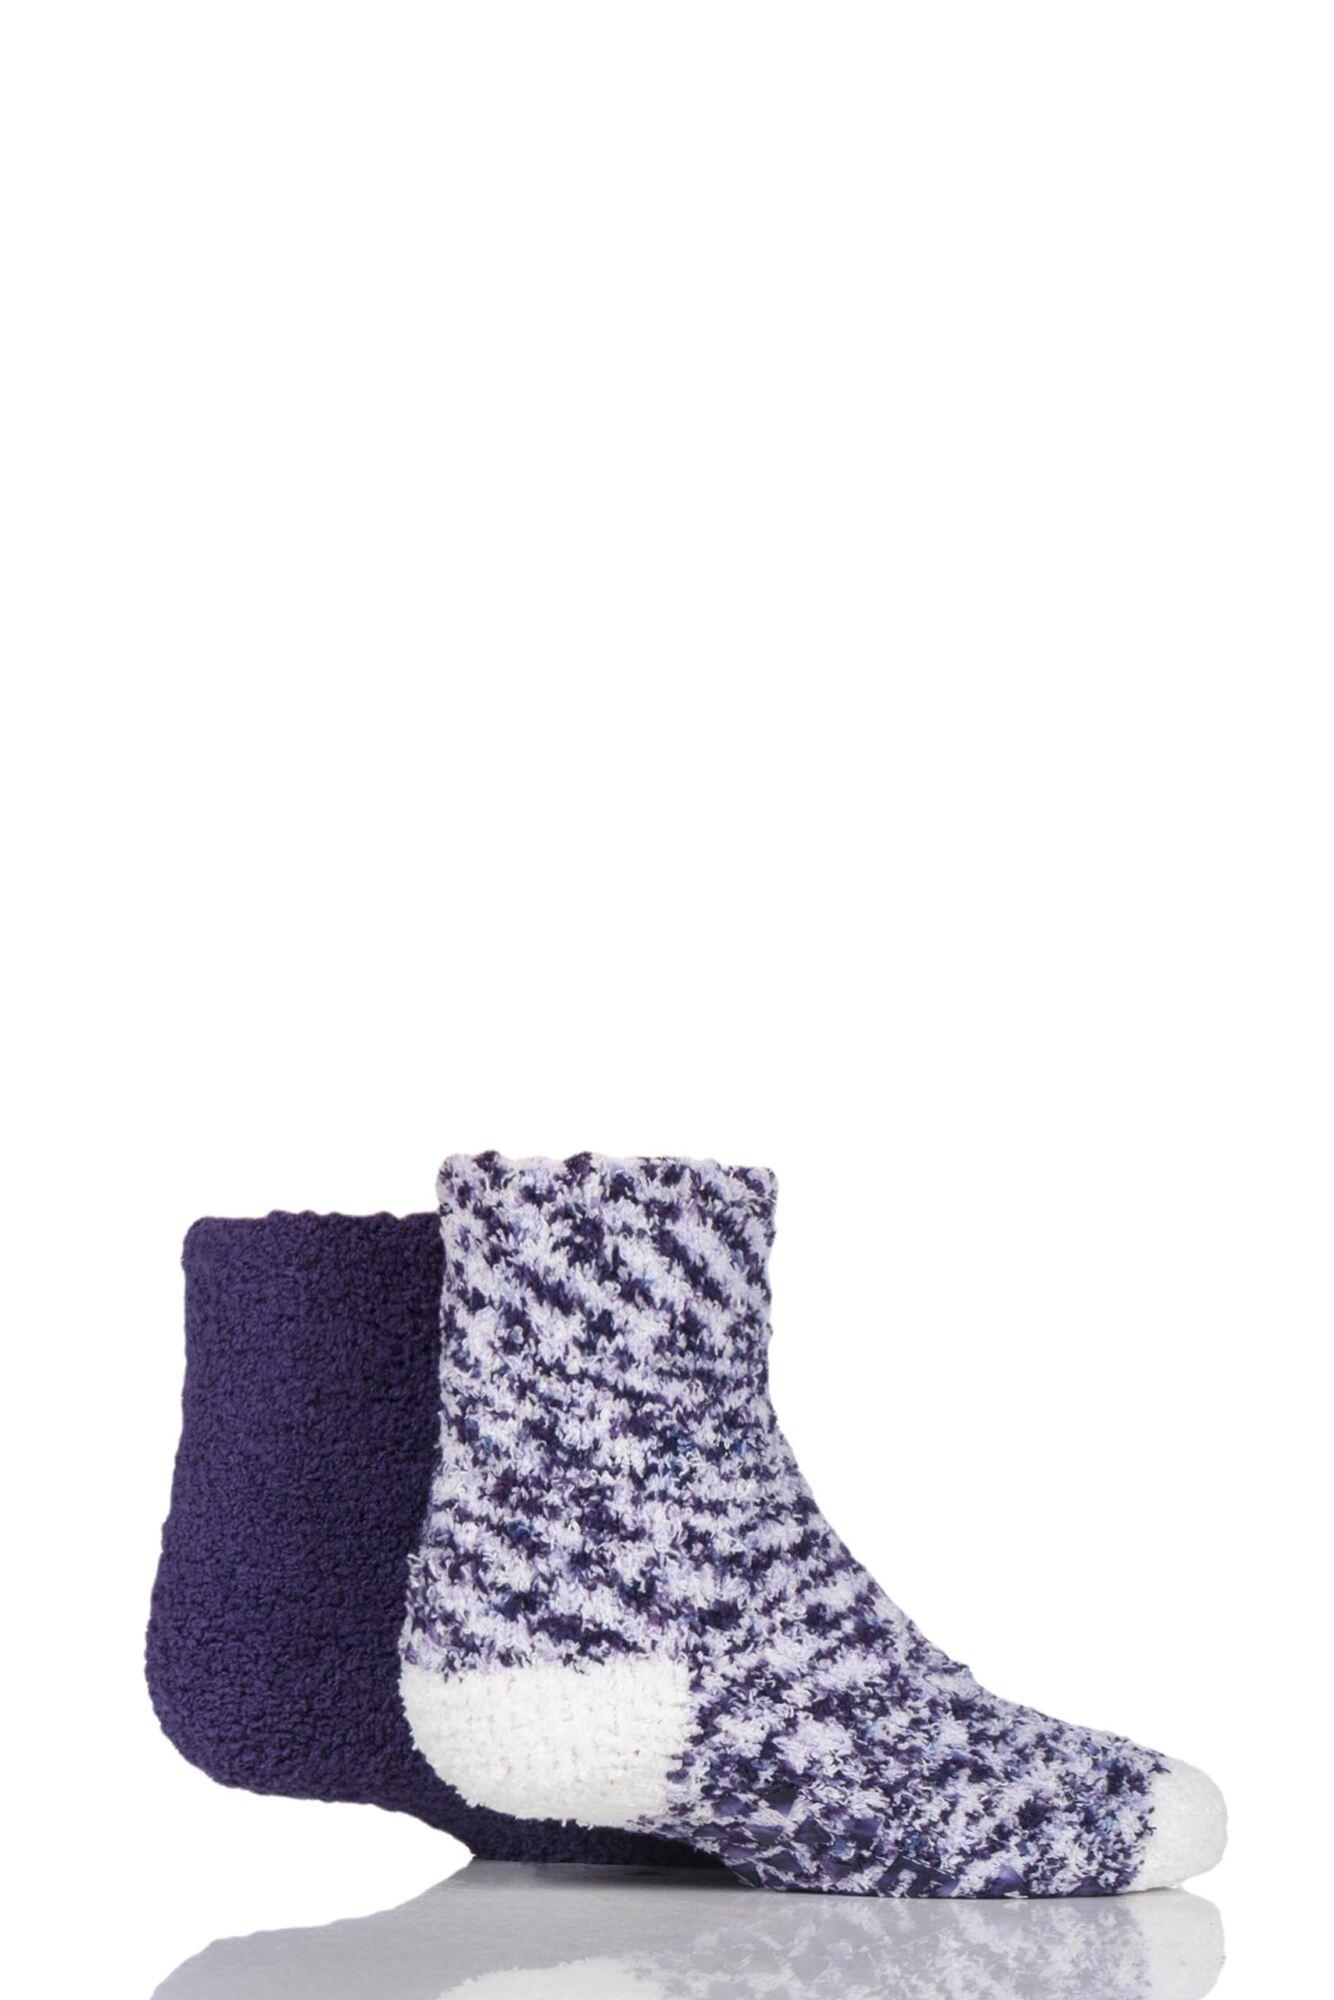 2 Pair Cosy Bed And Slipper Socks Girls - Elle